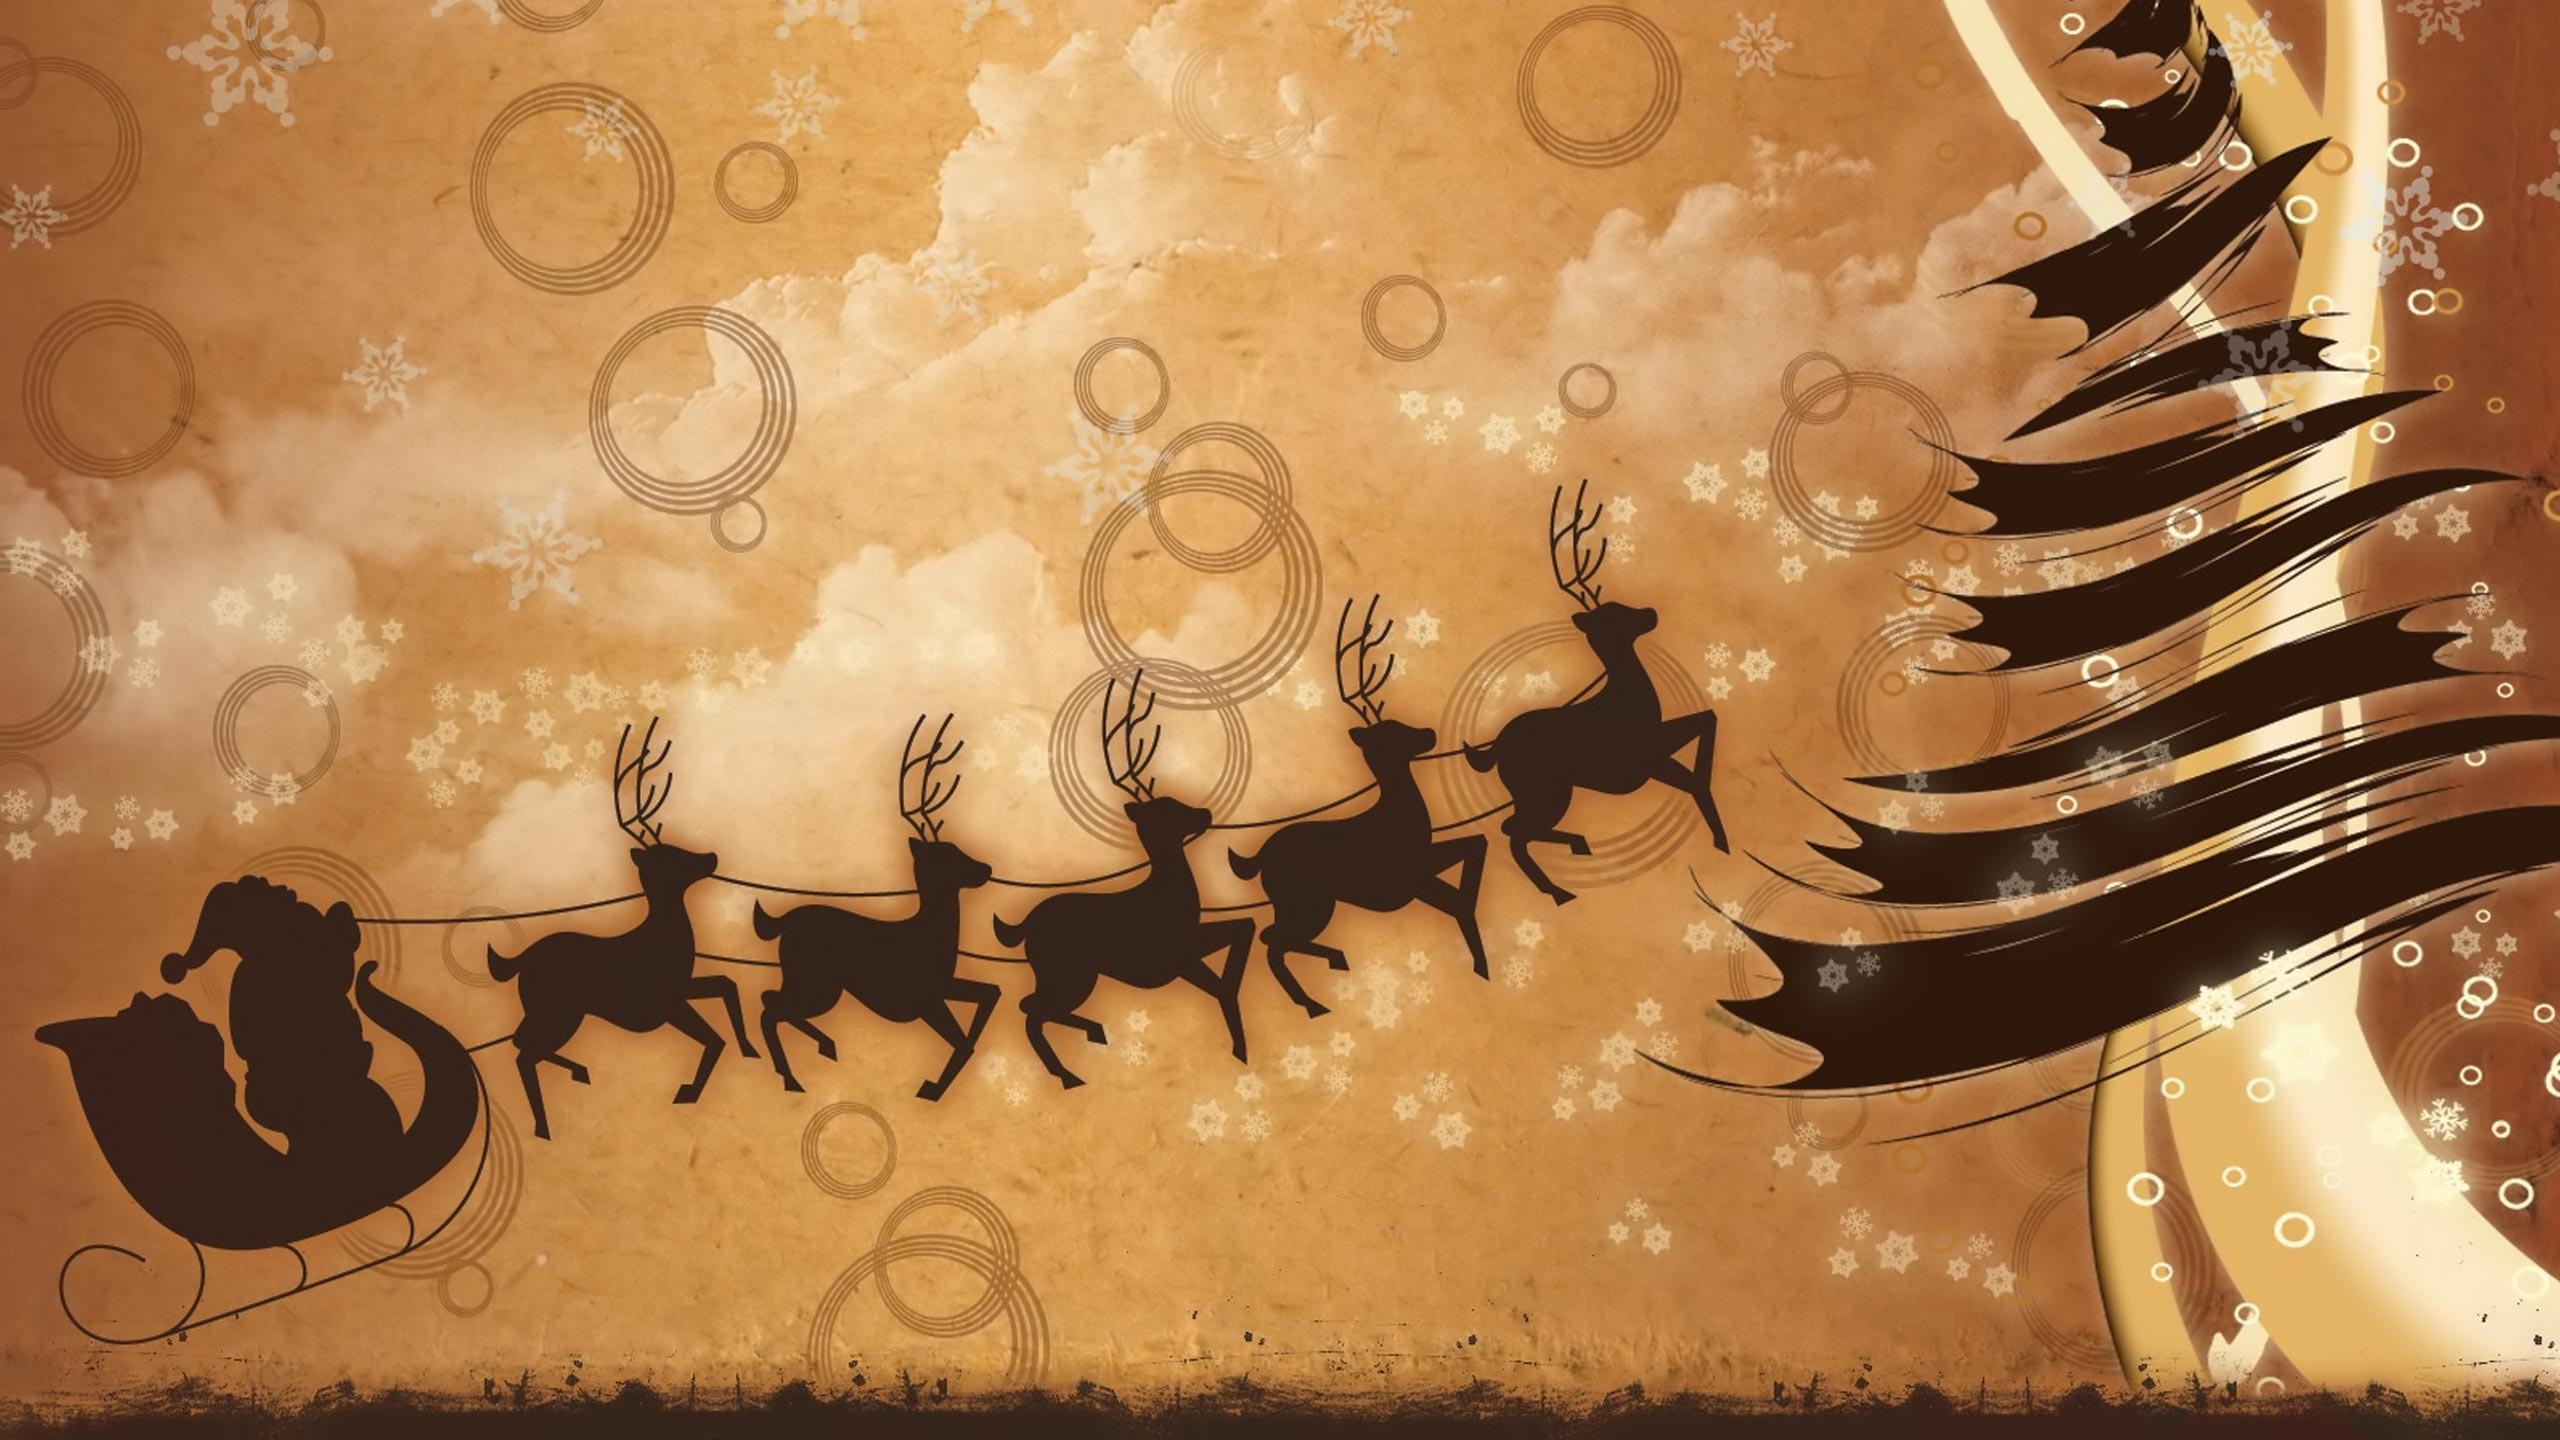 Santa Claus Reindeer Sleigh Wallpaper Download